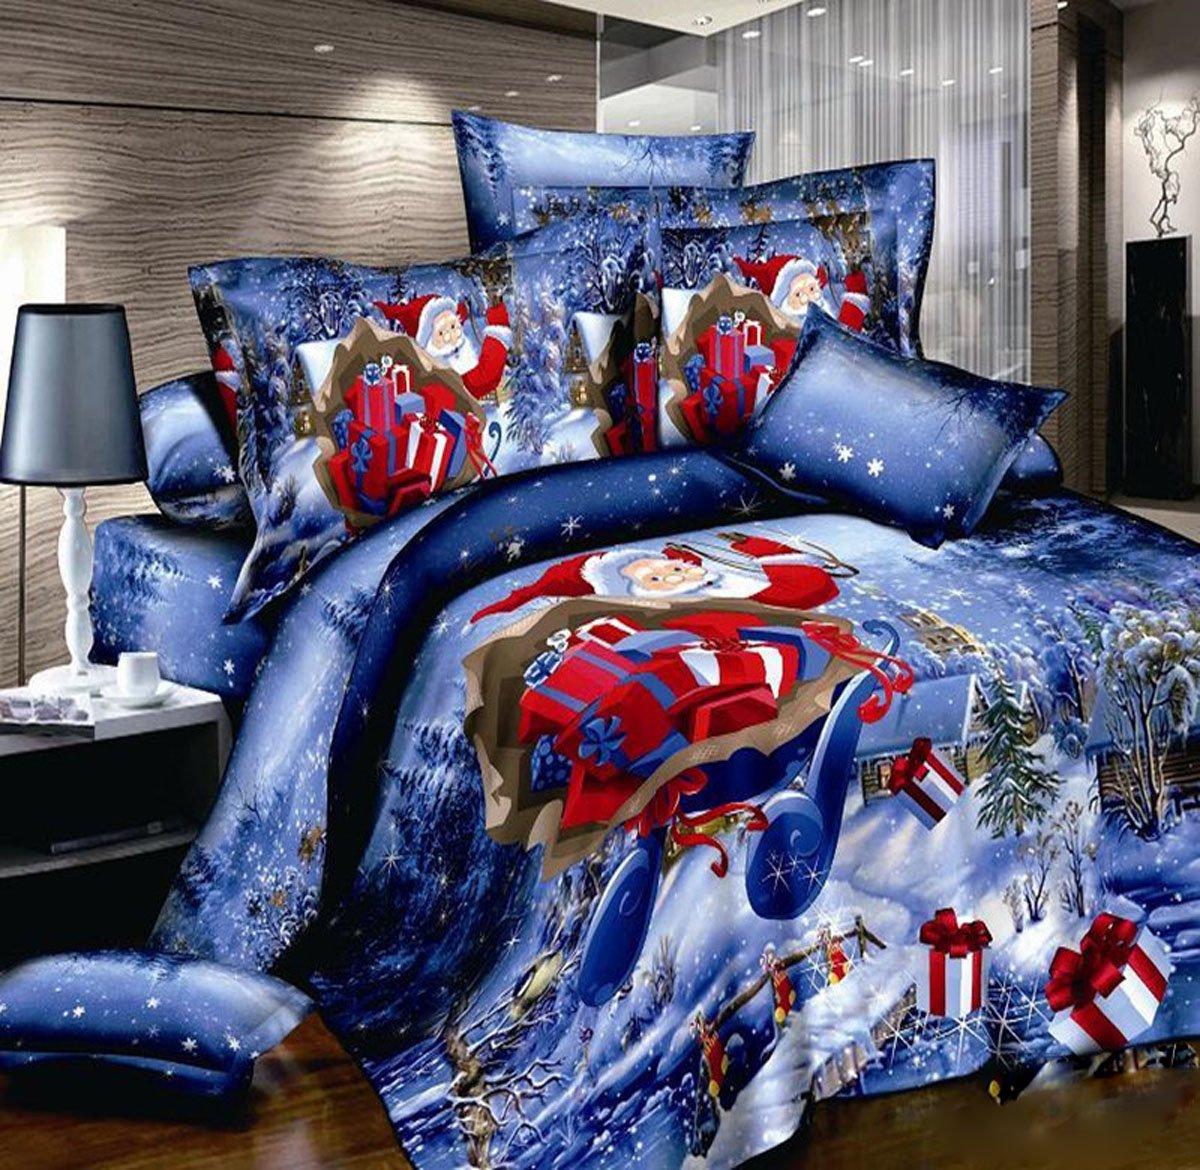 3D Christmas Santa Claus Bedding Set